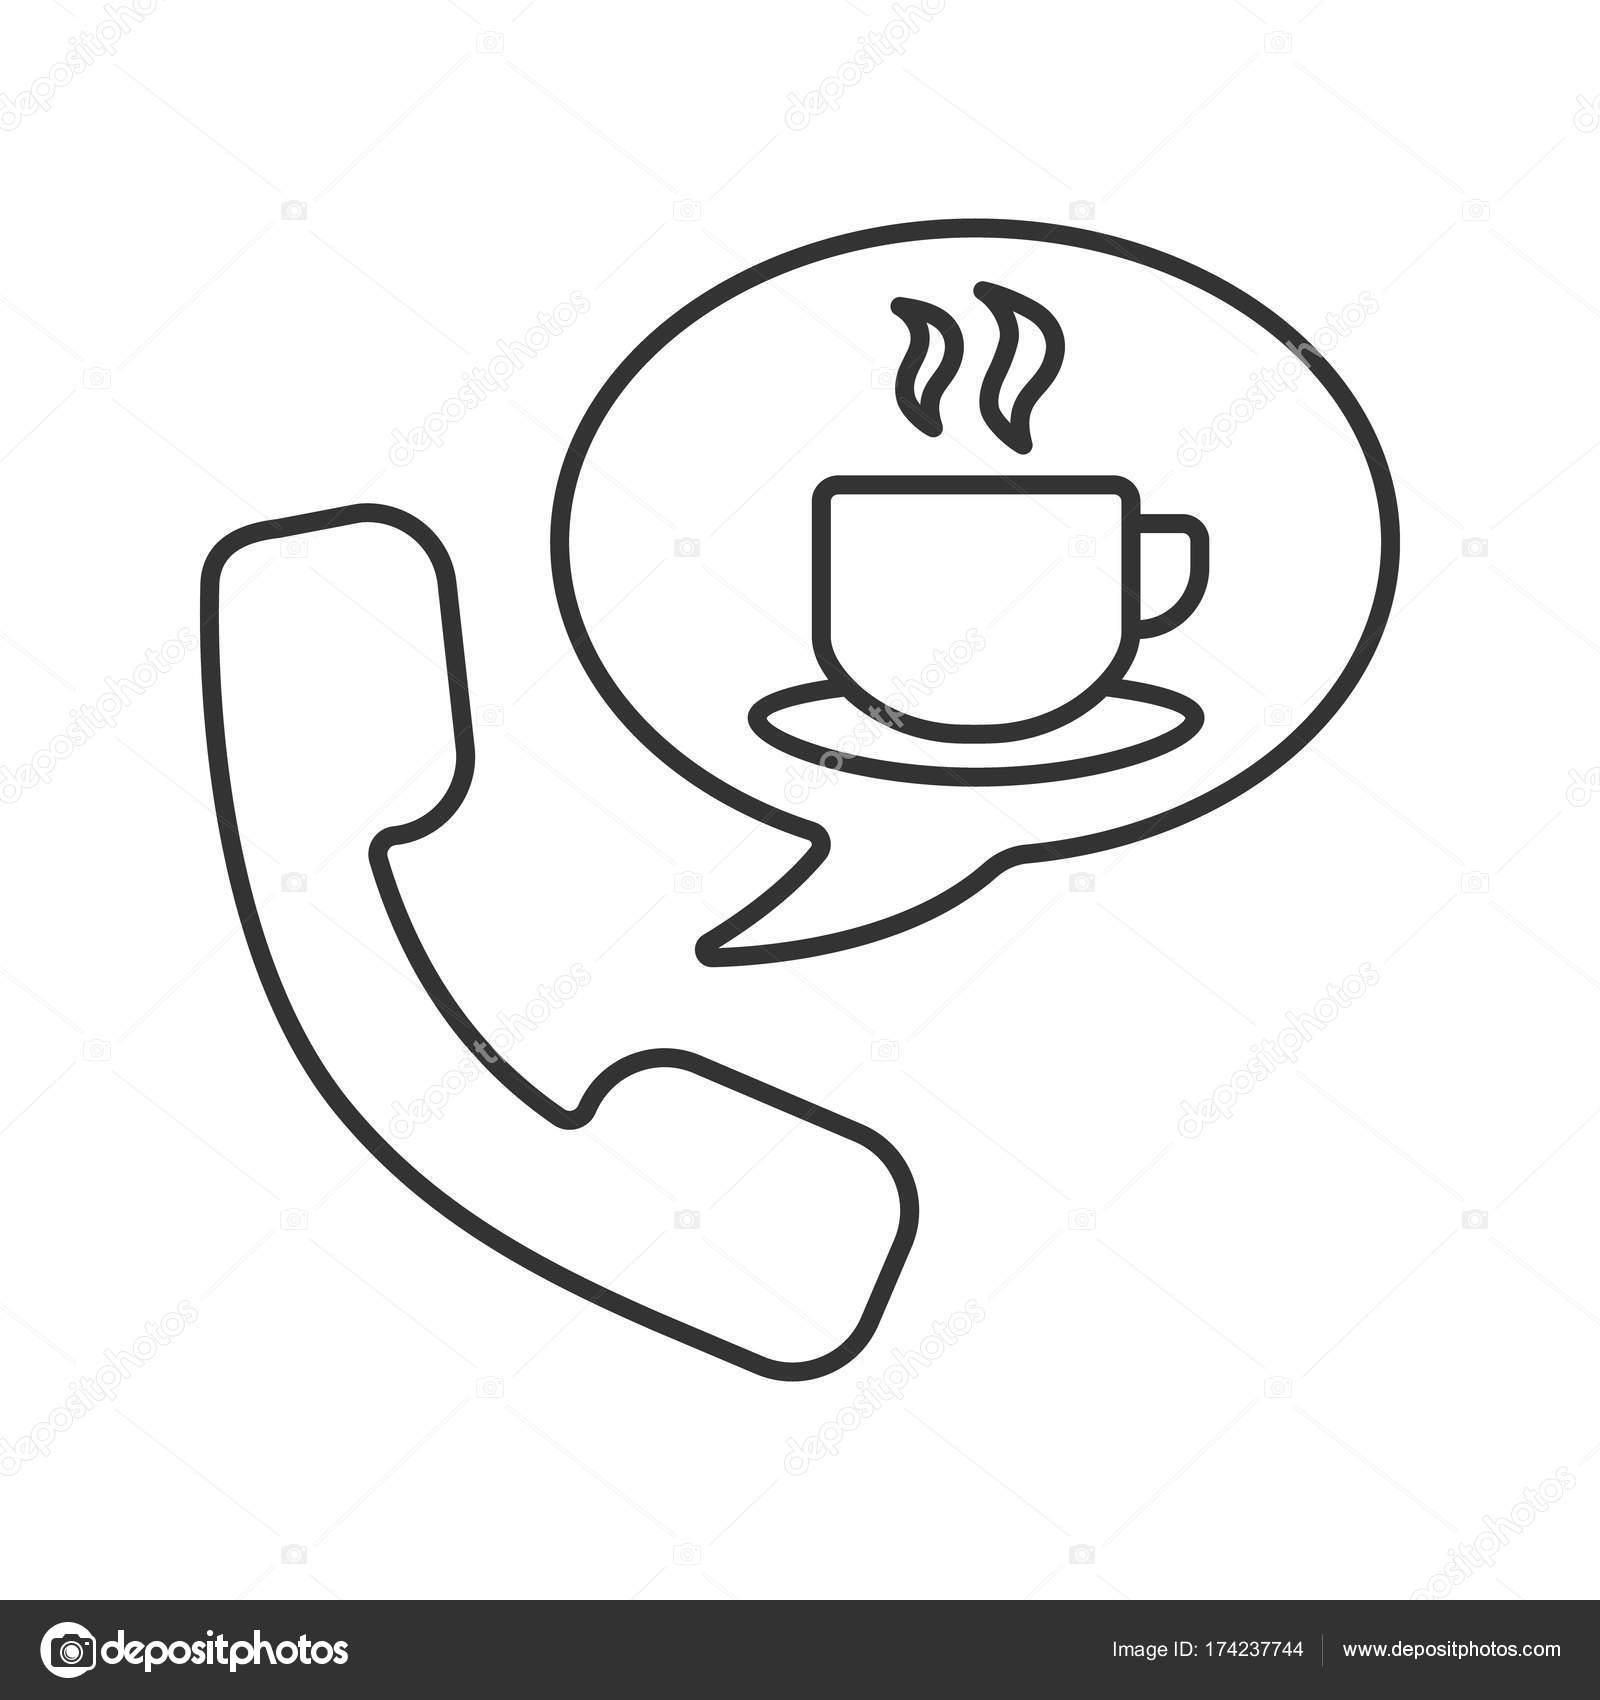 Heiße Getränke Telefon bestellen-Symbol — Stockvektor © bsd #174237744